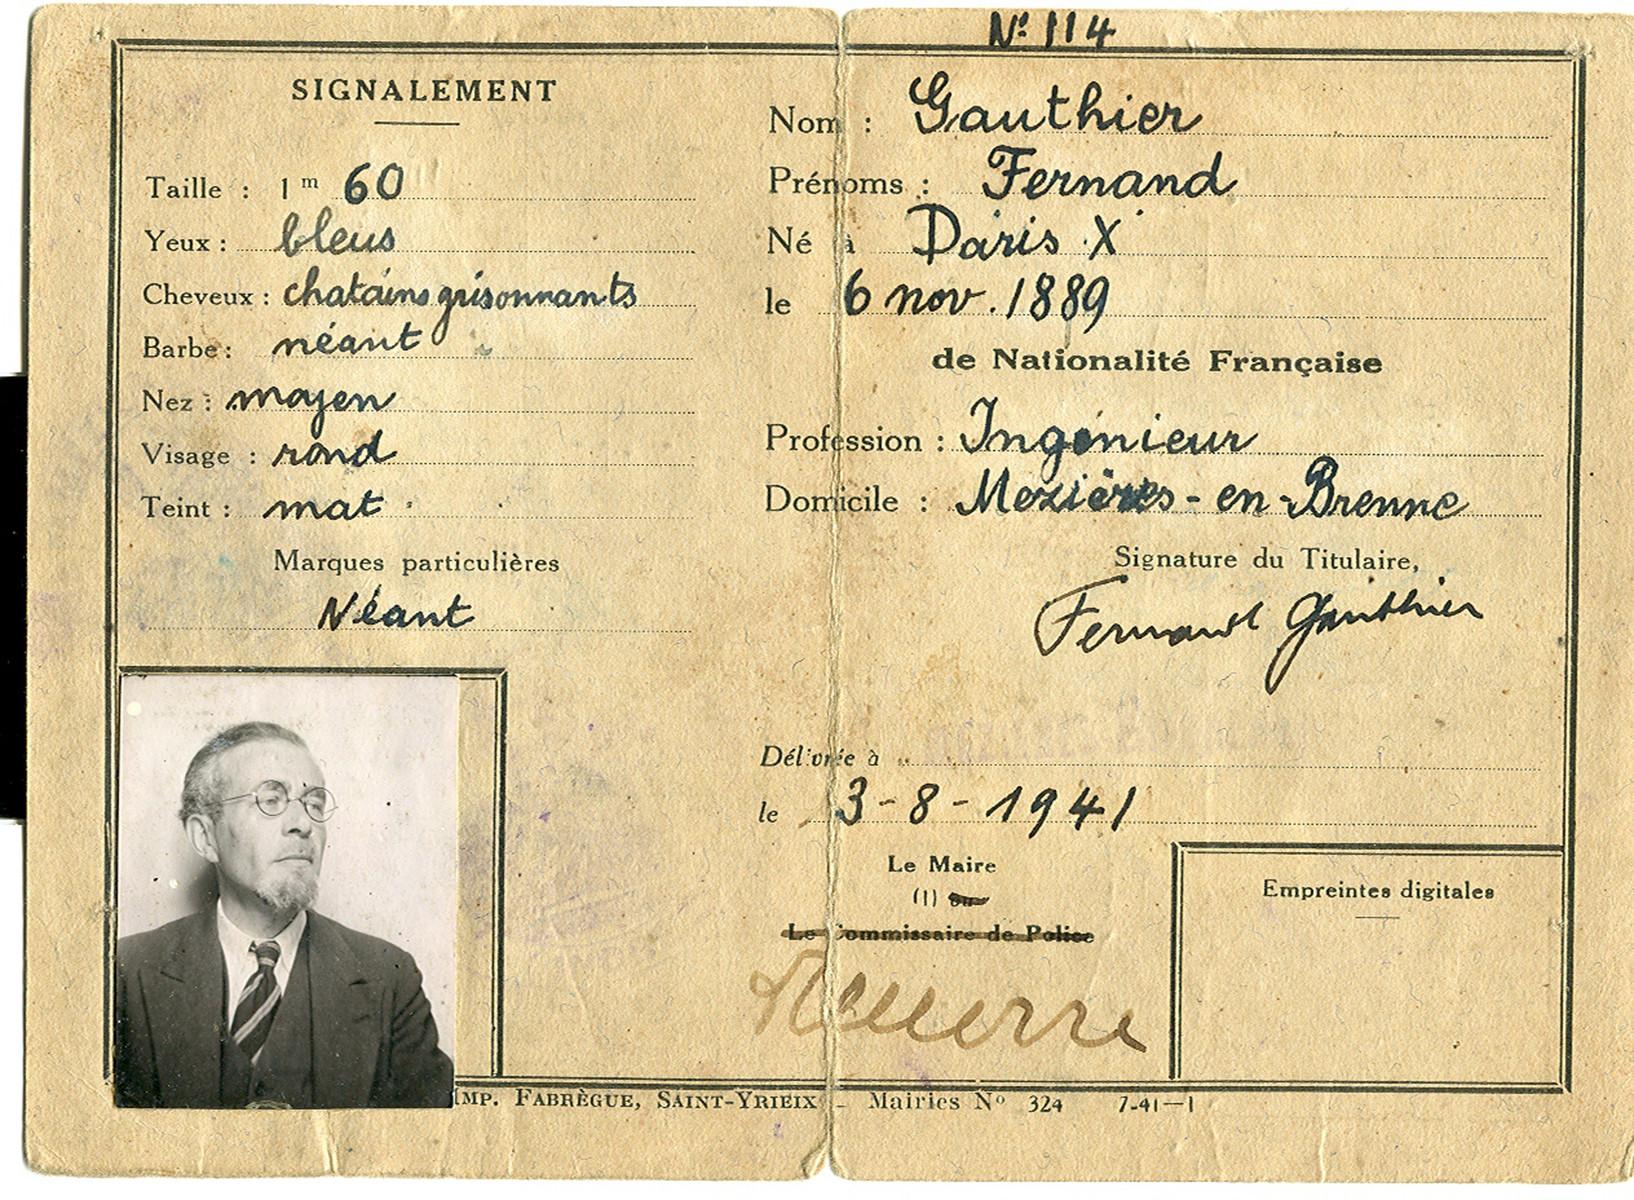 False identification paper issued to Felix Goldschmidt under the name Fernand Gauthier.